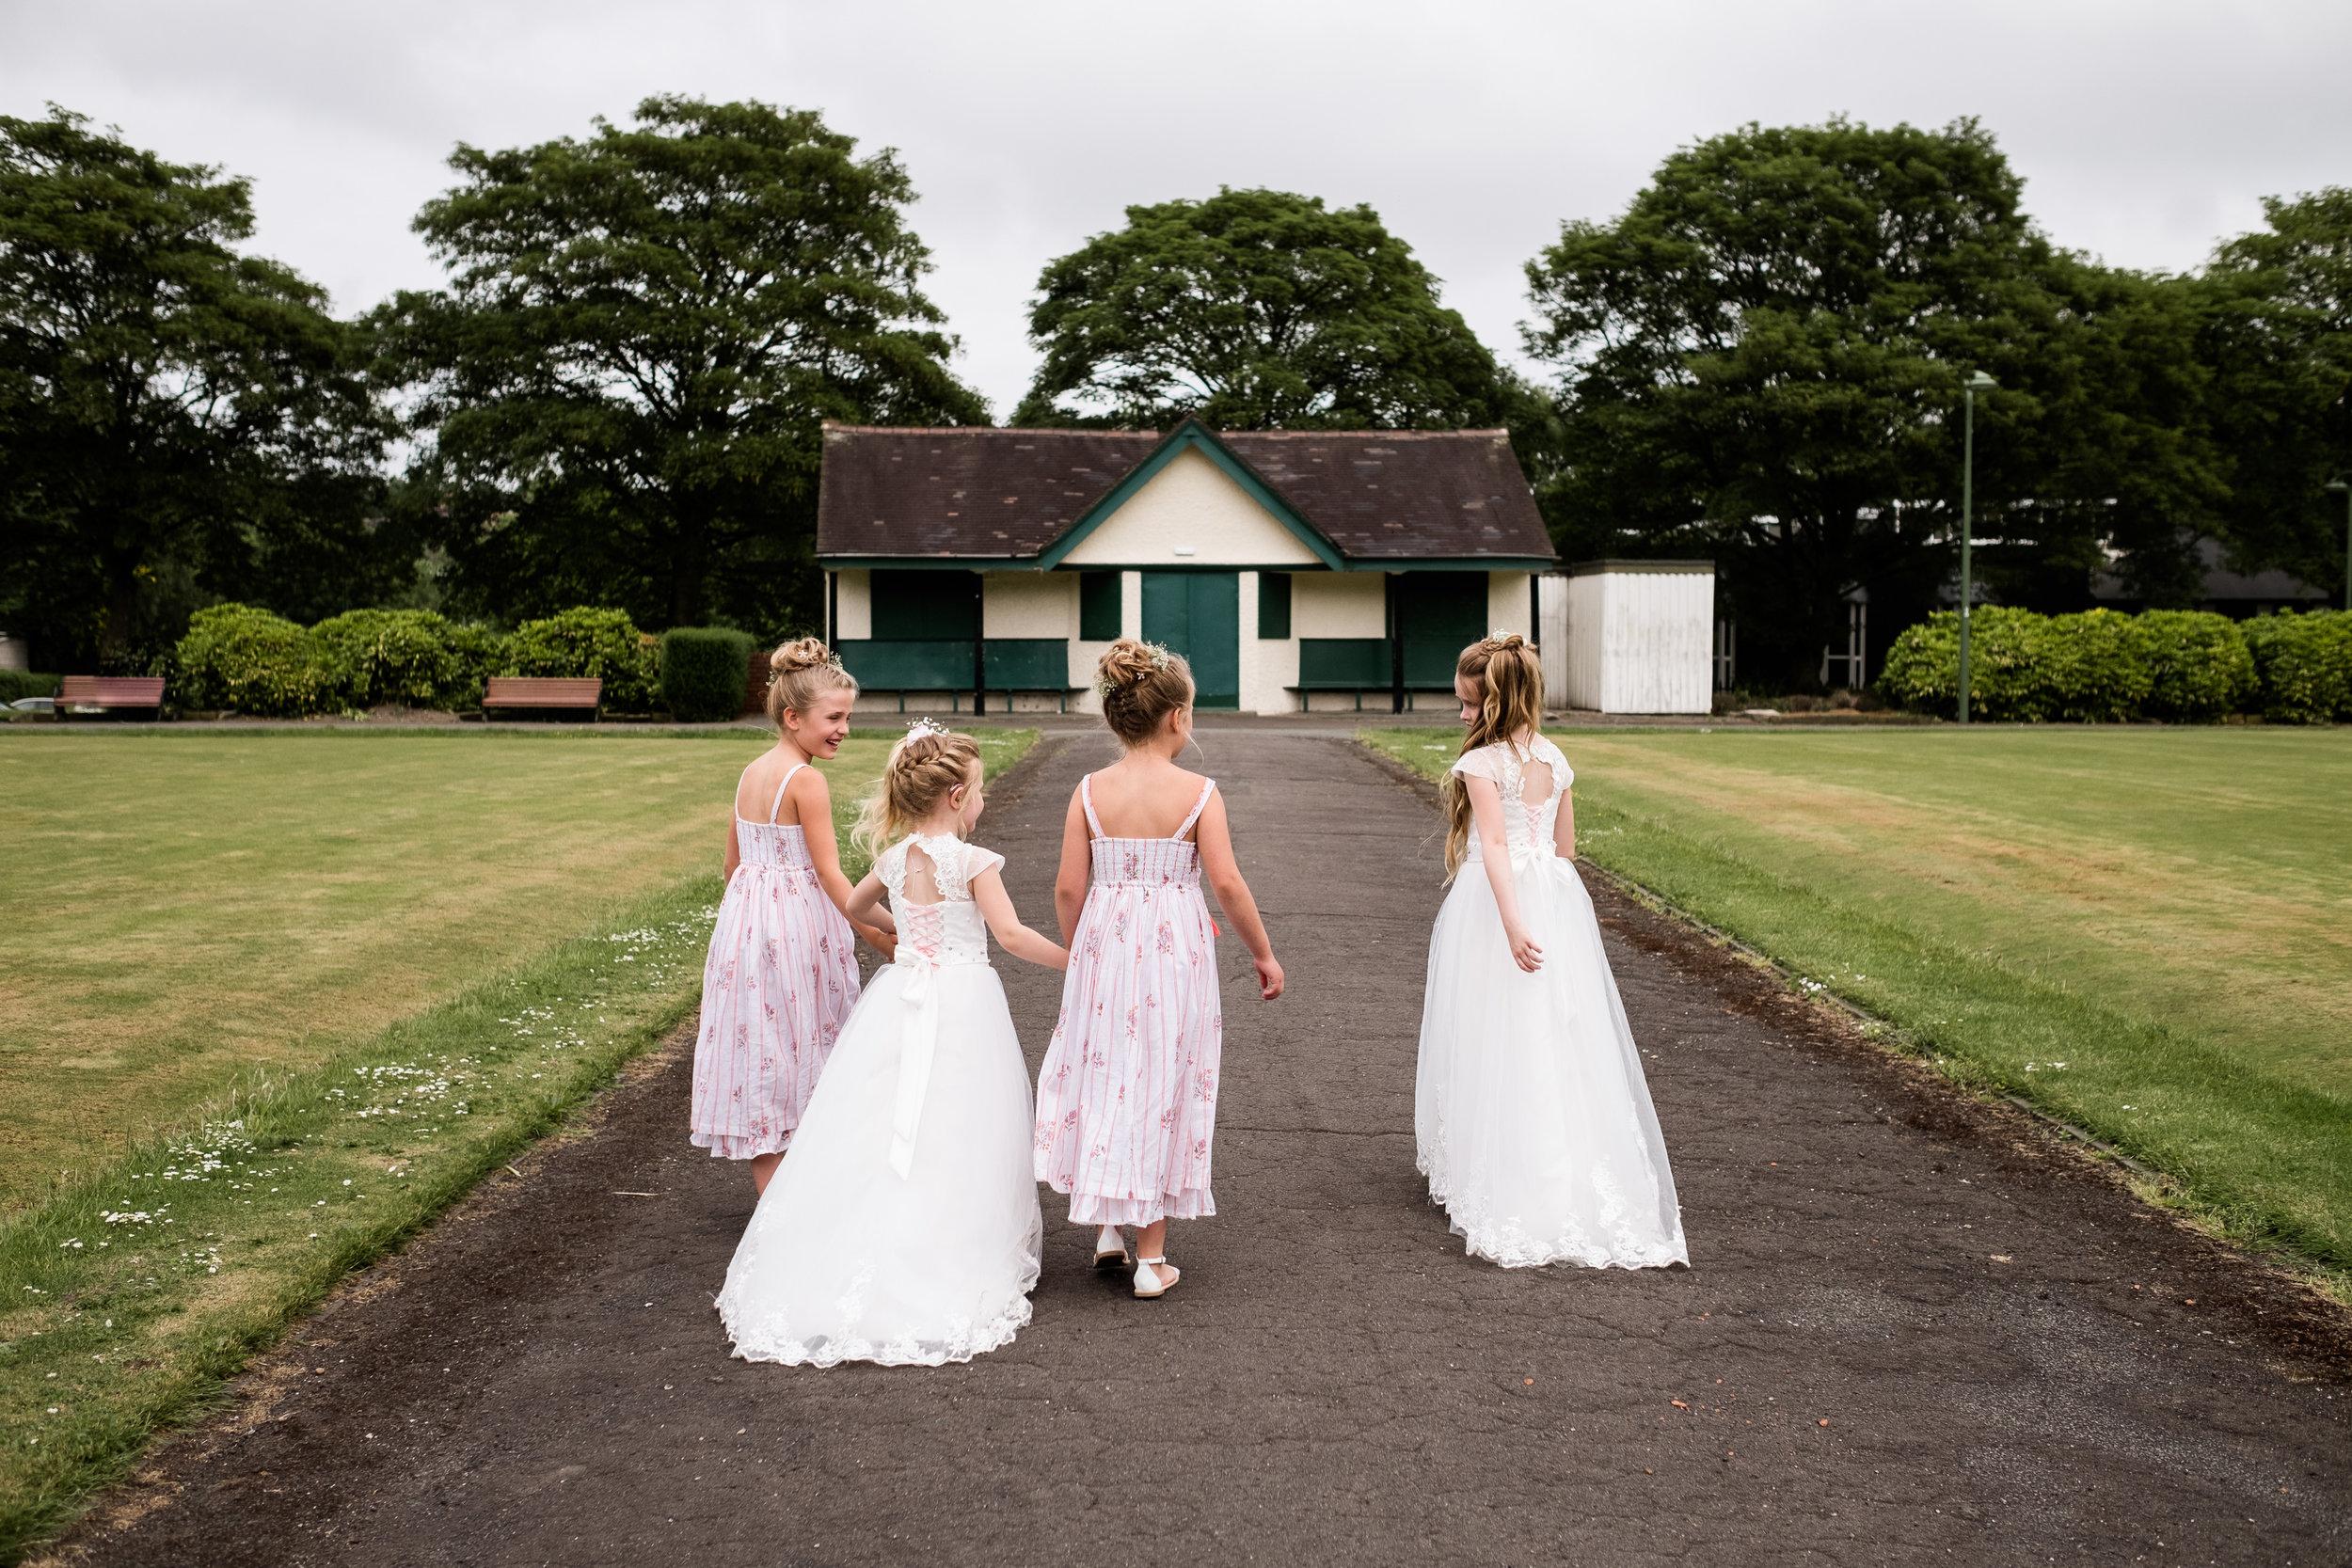 Summer Documentary Wedding Photography Floral Hall, Stoke-on-Trent, Staffordshire - Jenny Harper-35.jpg